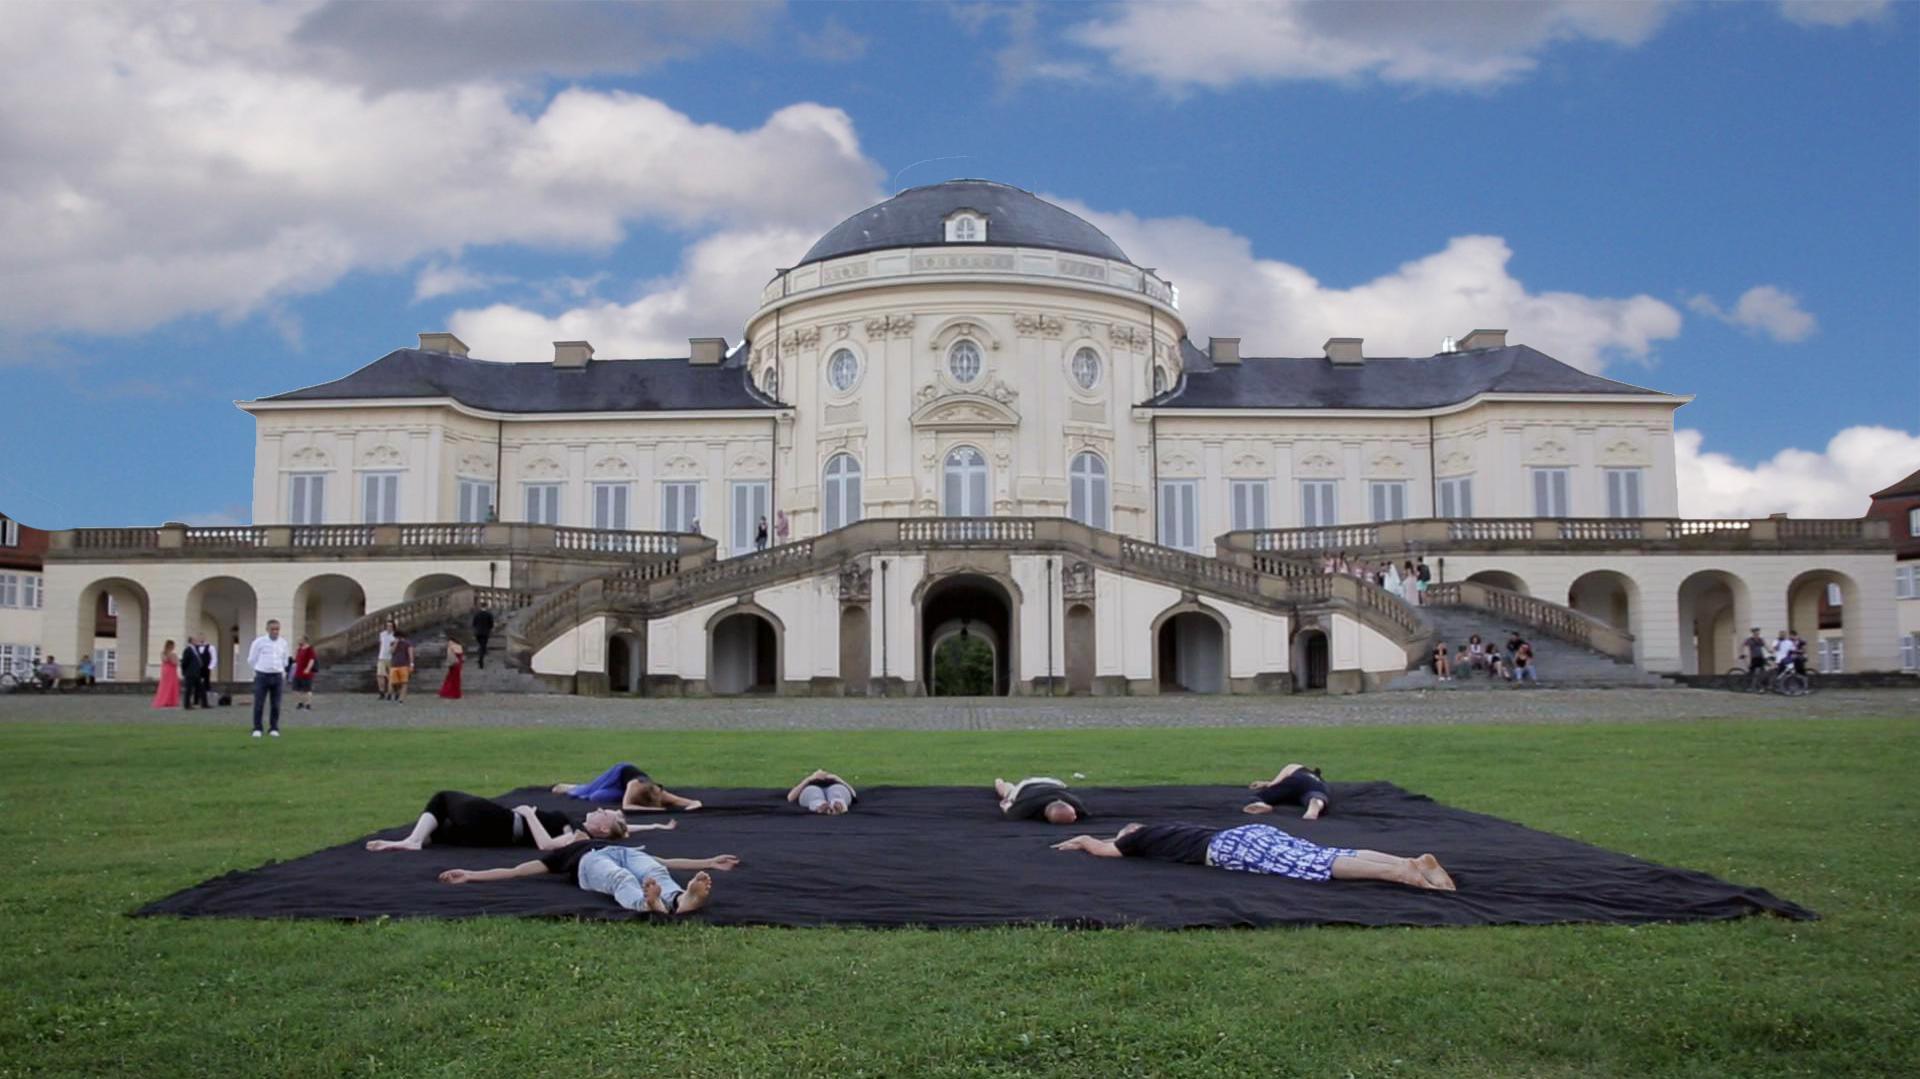 Home | Akademie Schloss Solitude: Schlosspost